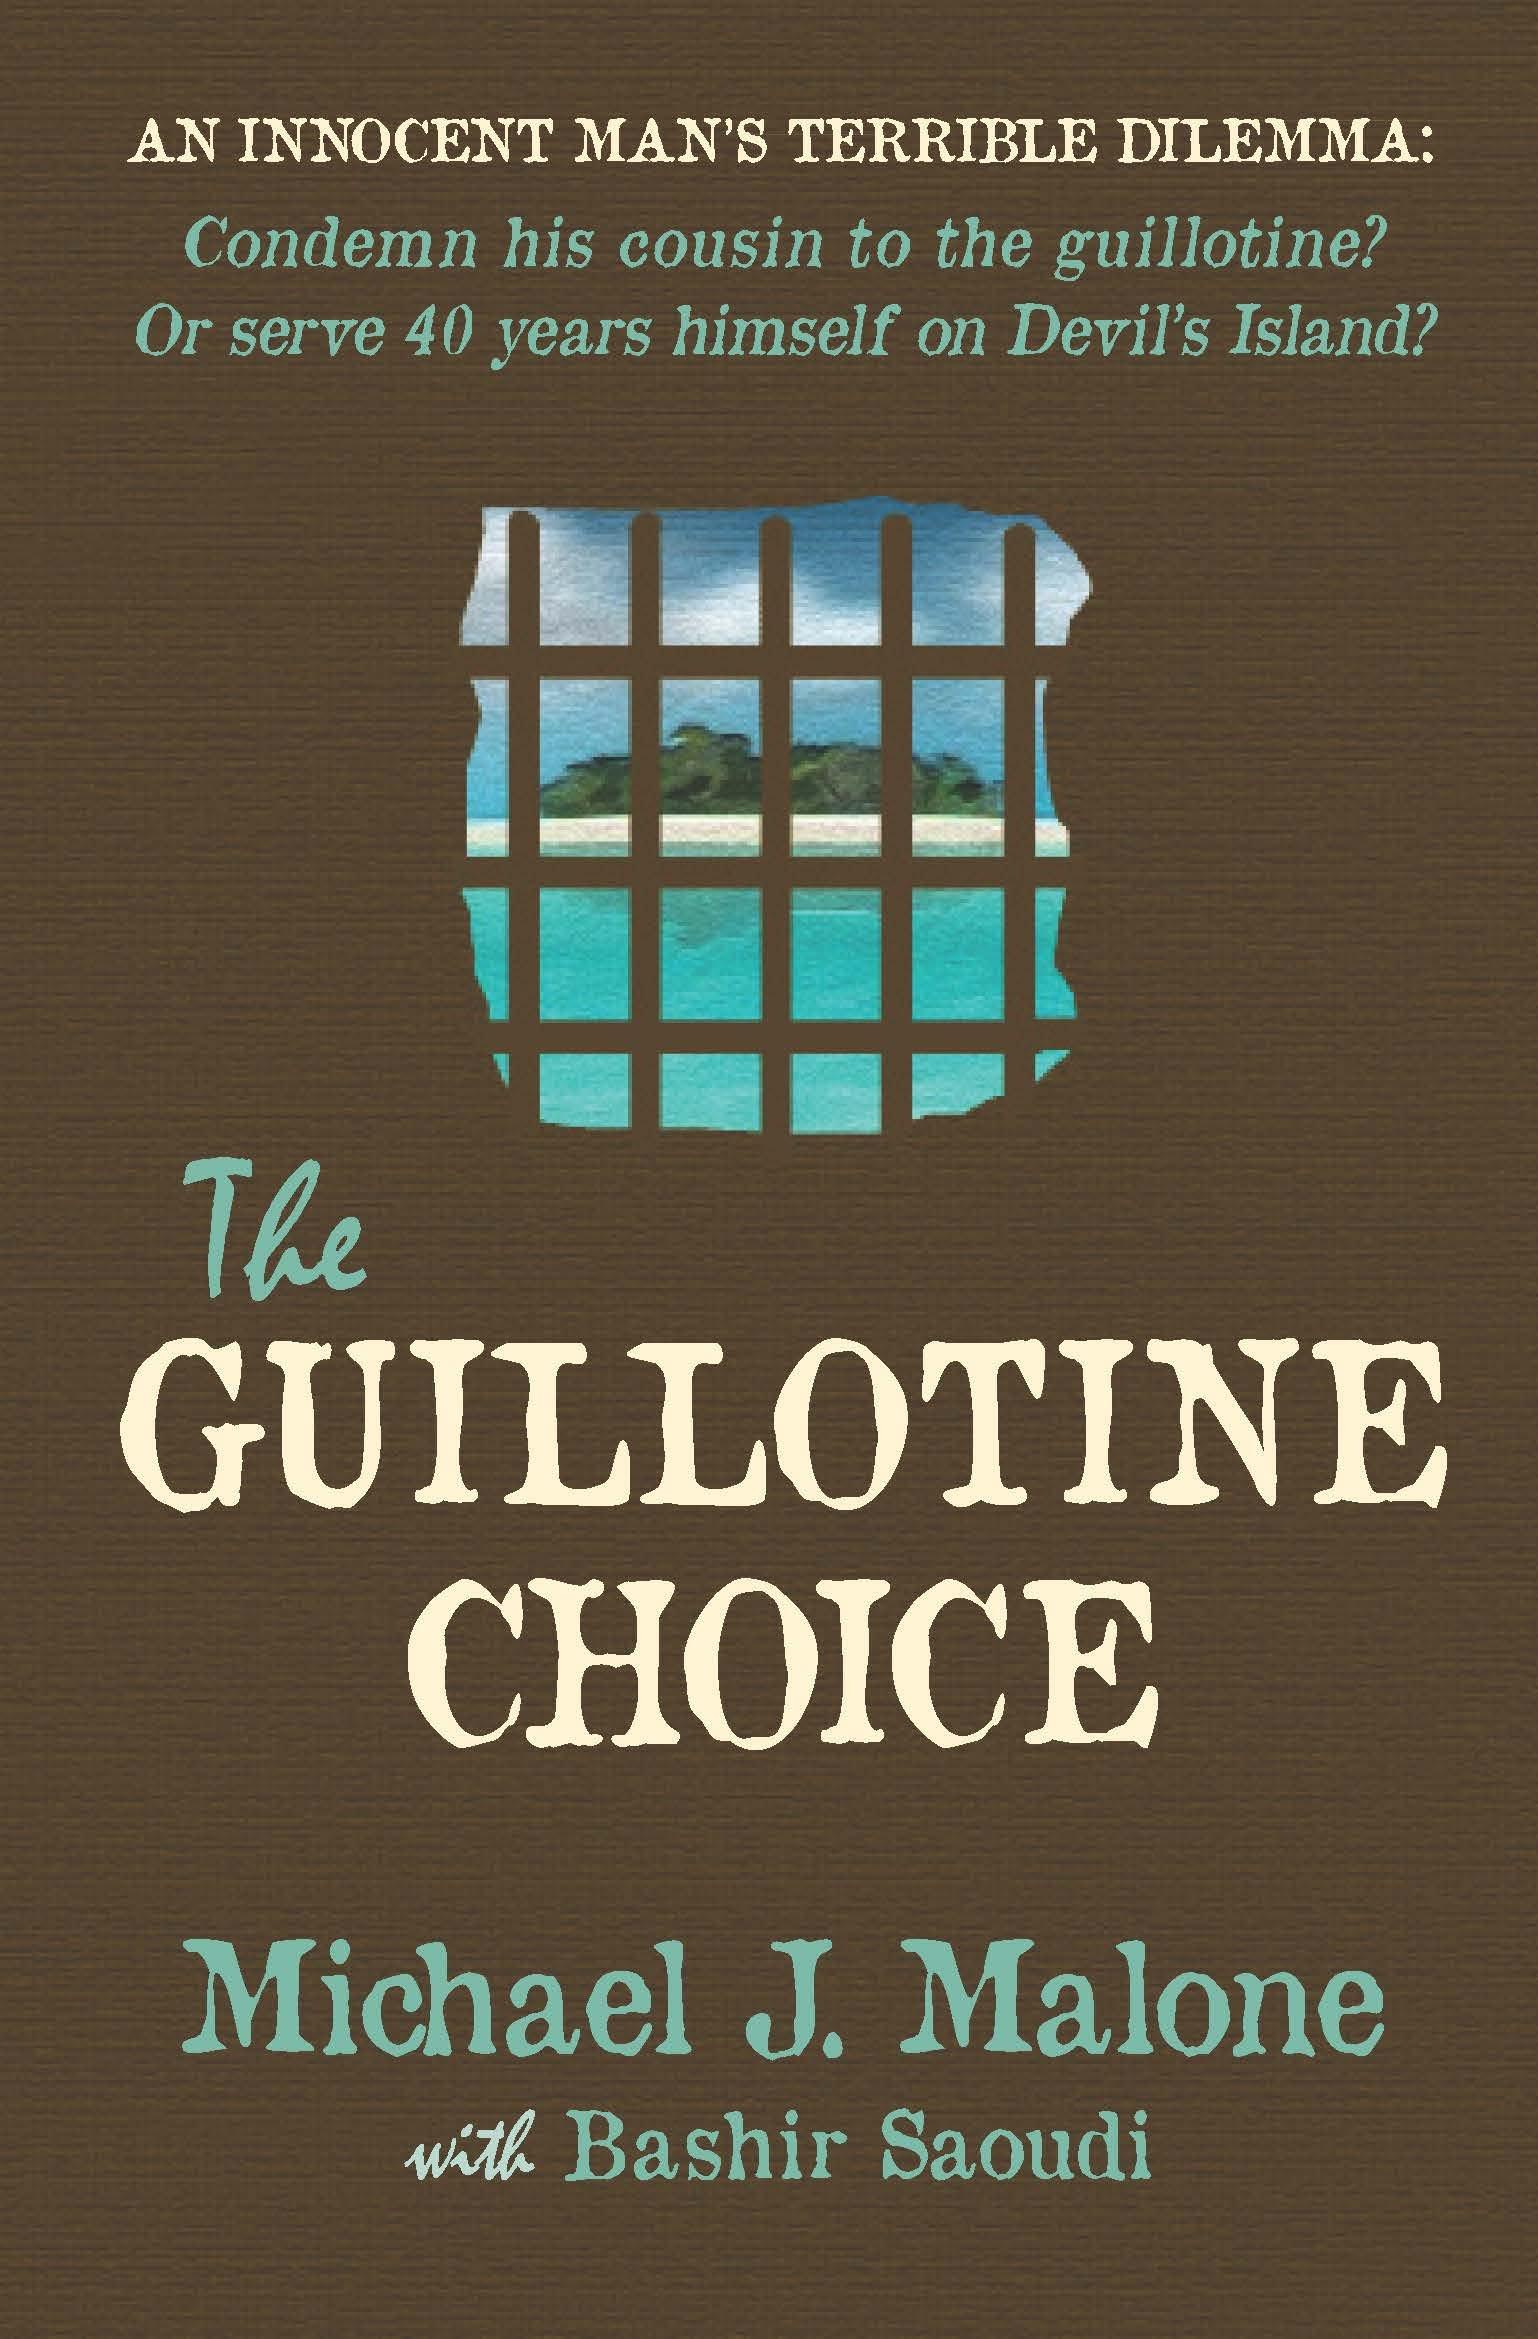 The Guillotine Choice ebook